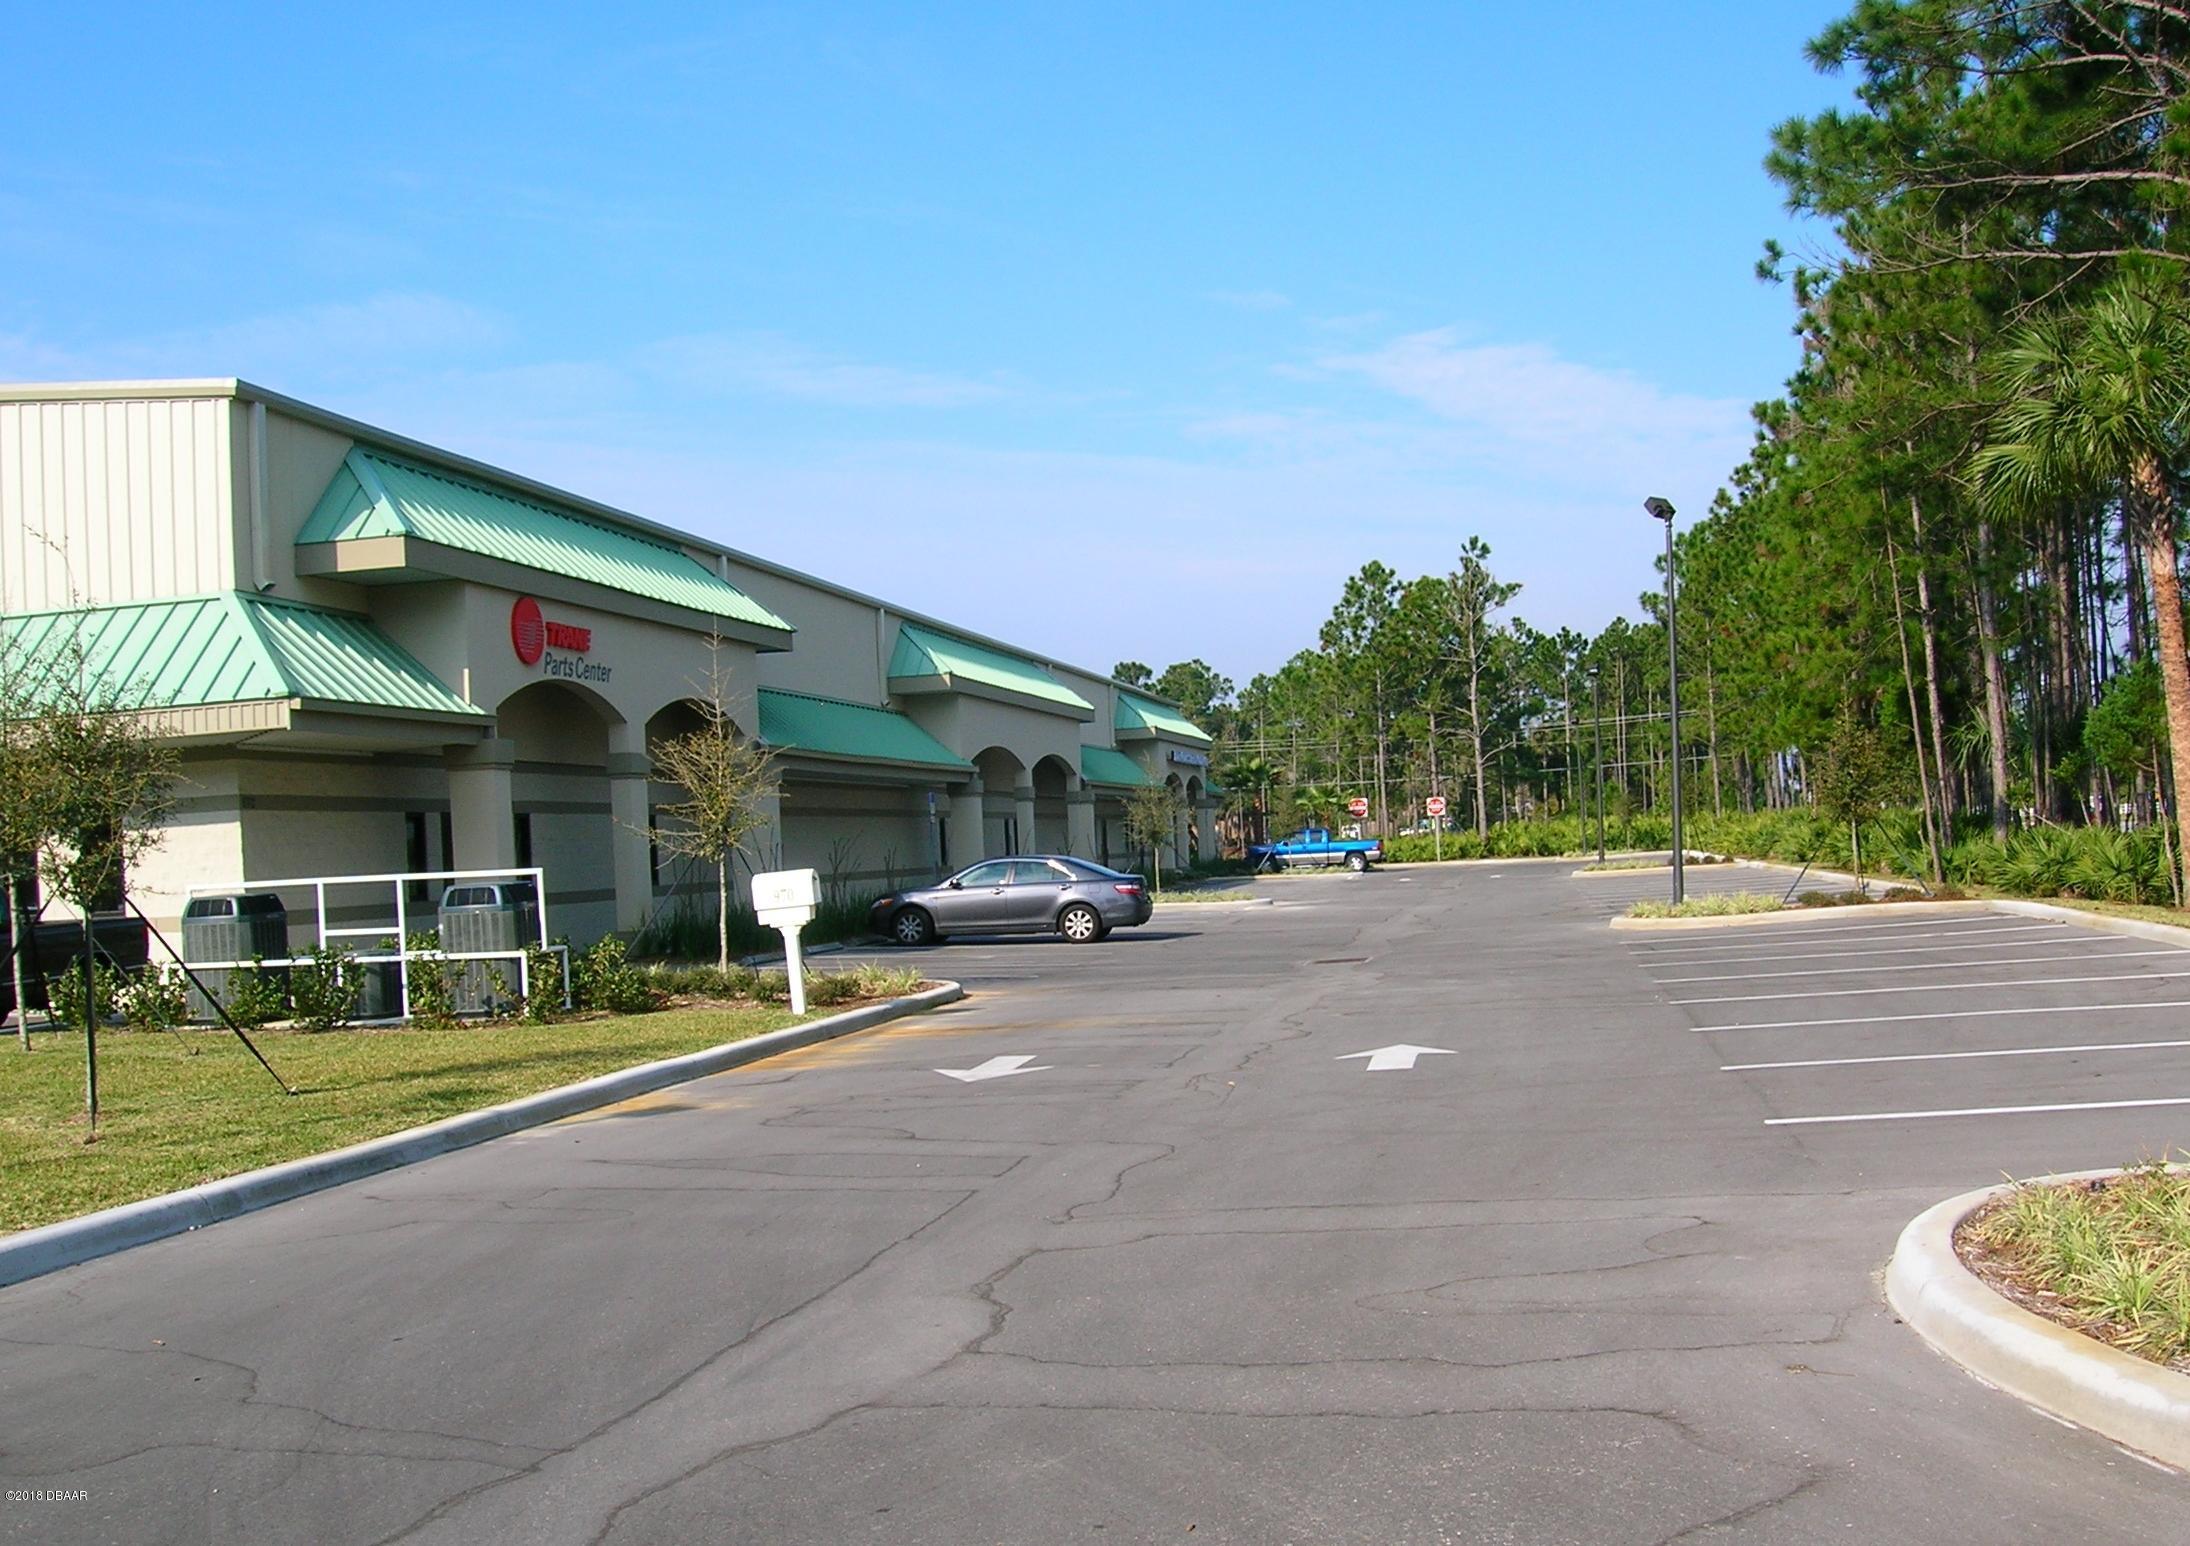 Photo of 970 N Clyde Morris Boulevard, Daytona Beach, FL 32117